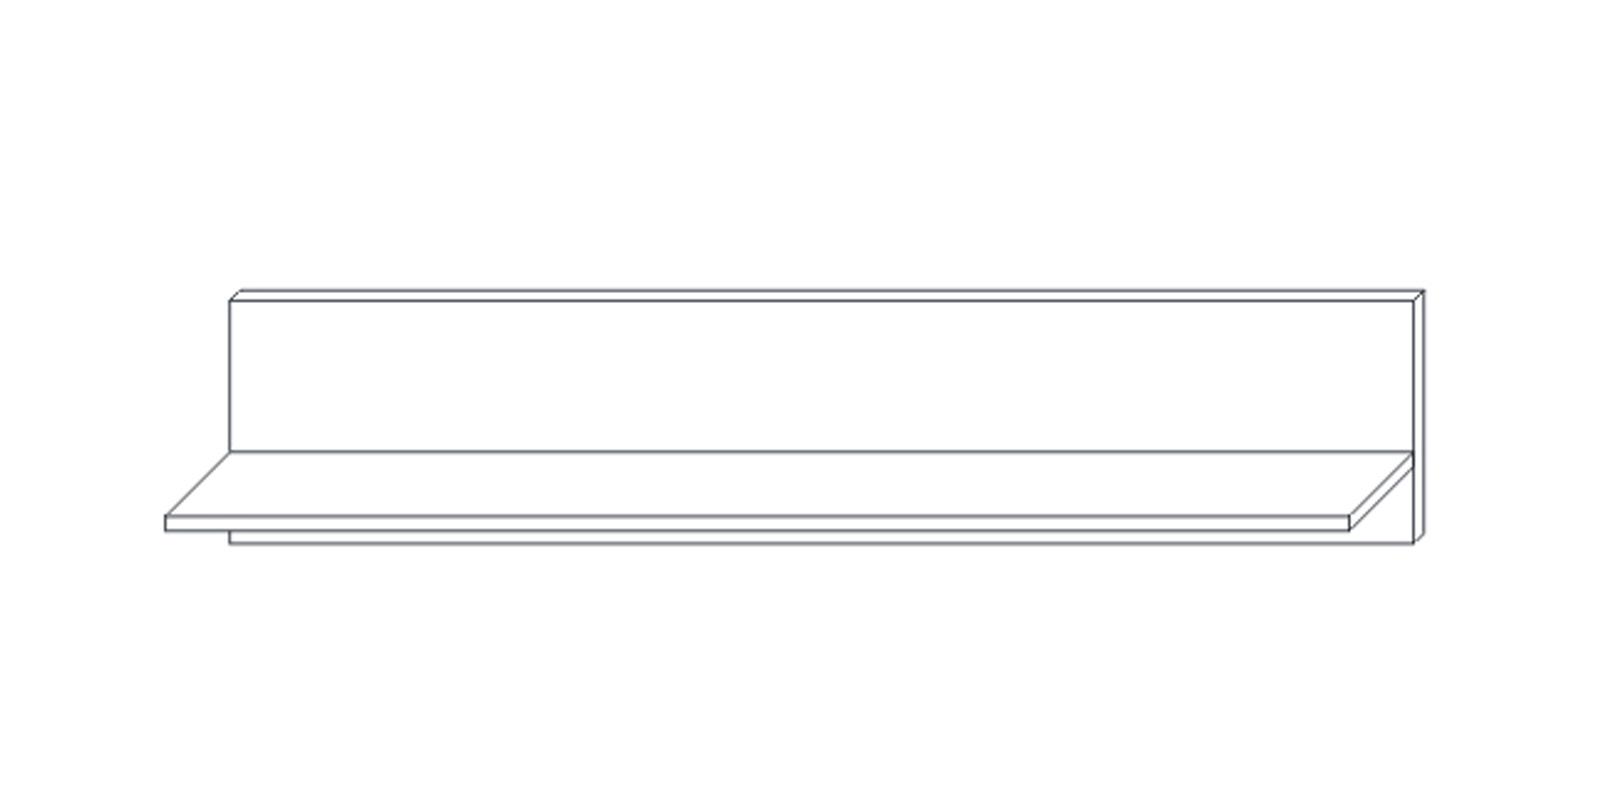 Полка навесная 1 900 «Сиена» Кураж